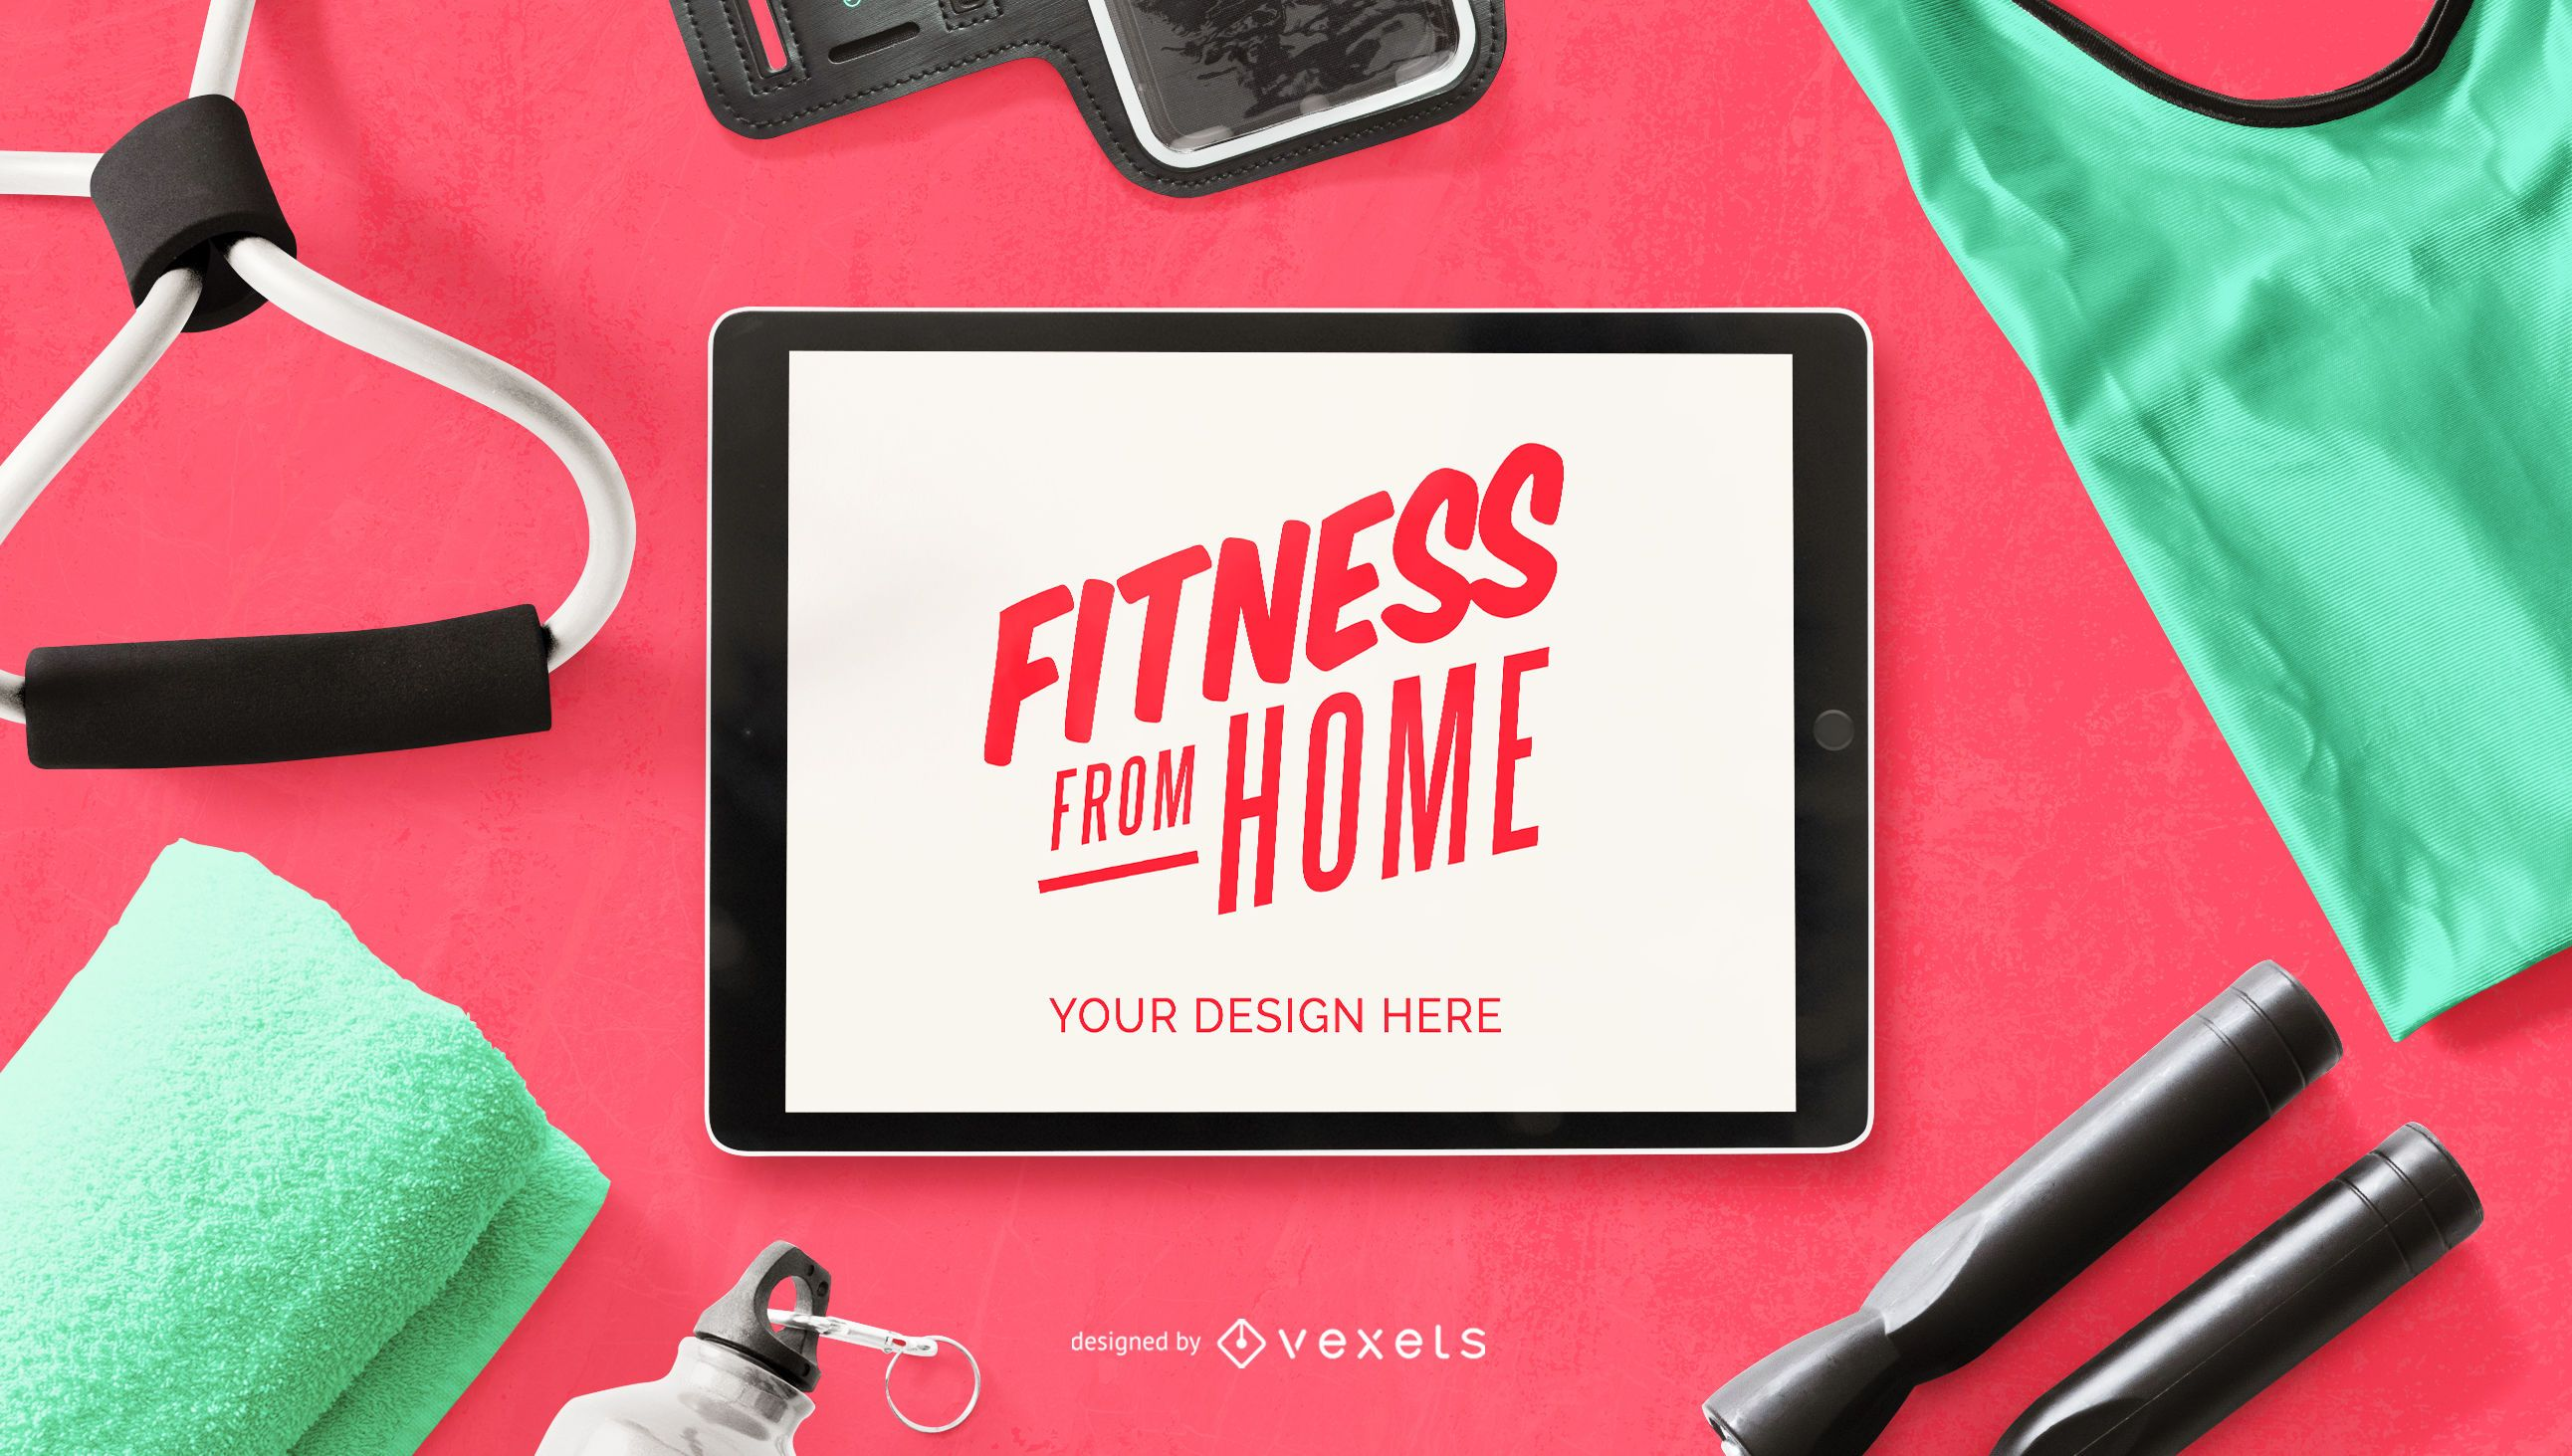 Fitness ipad mockup composition